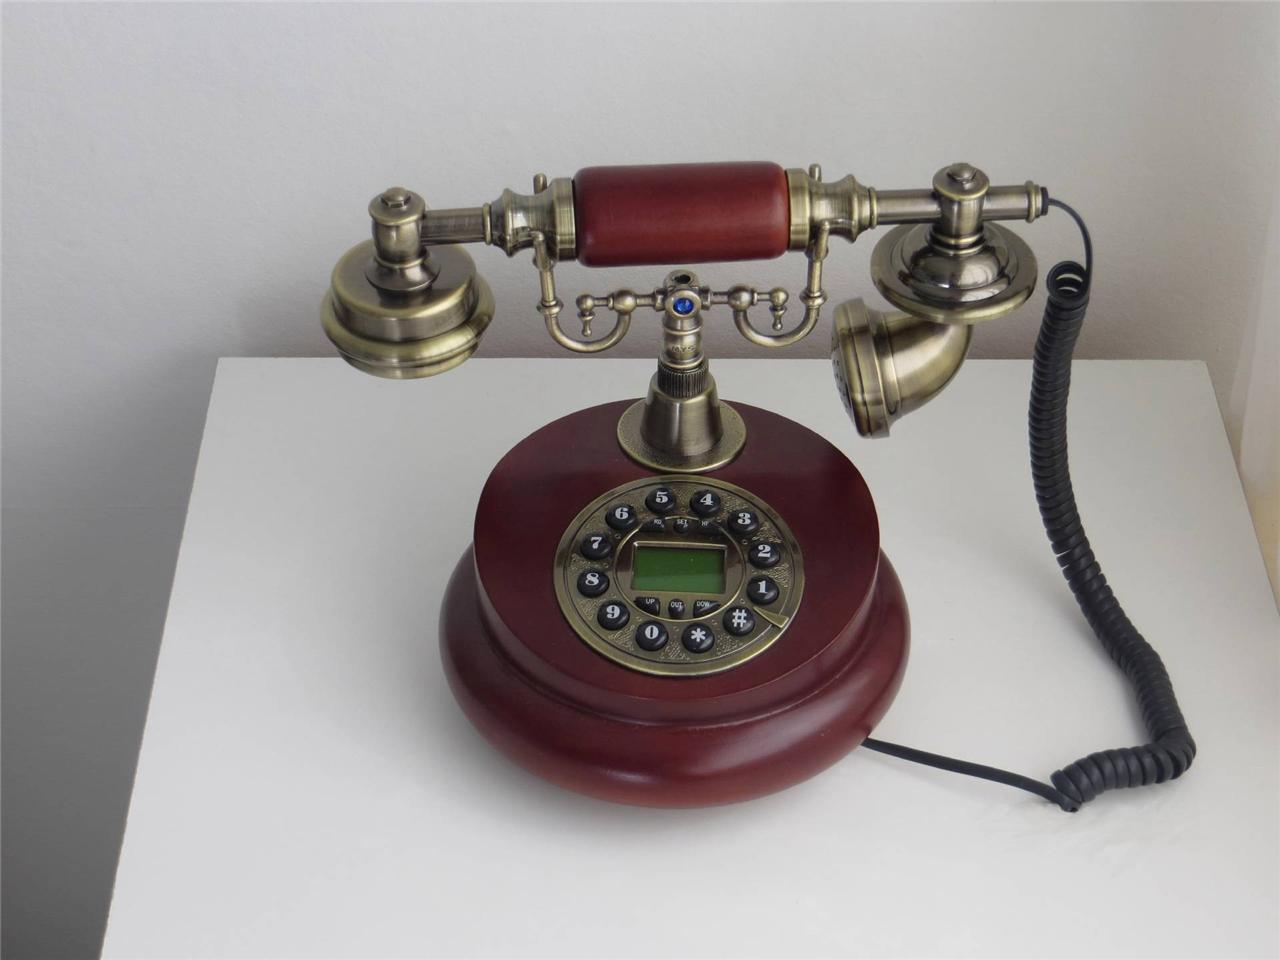 new antique desk telephone wooden button dial retro vintage corded home decor ebay. Black Bedroom Furniture Sets. Home Design Ideas